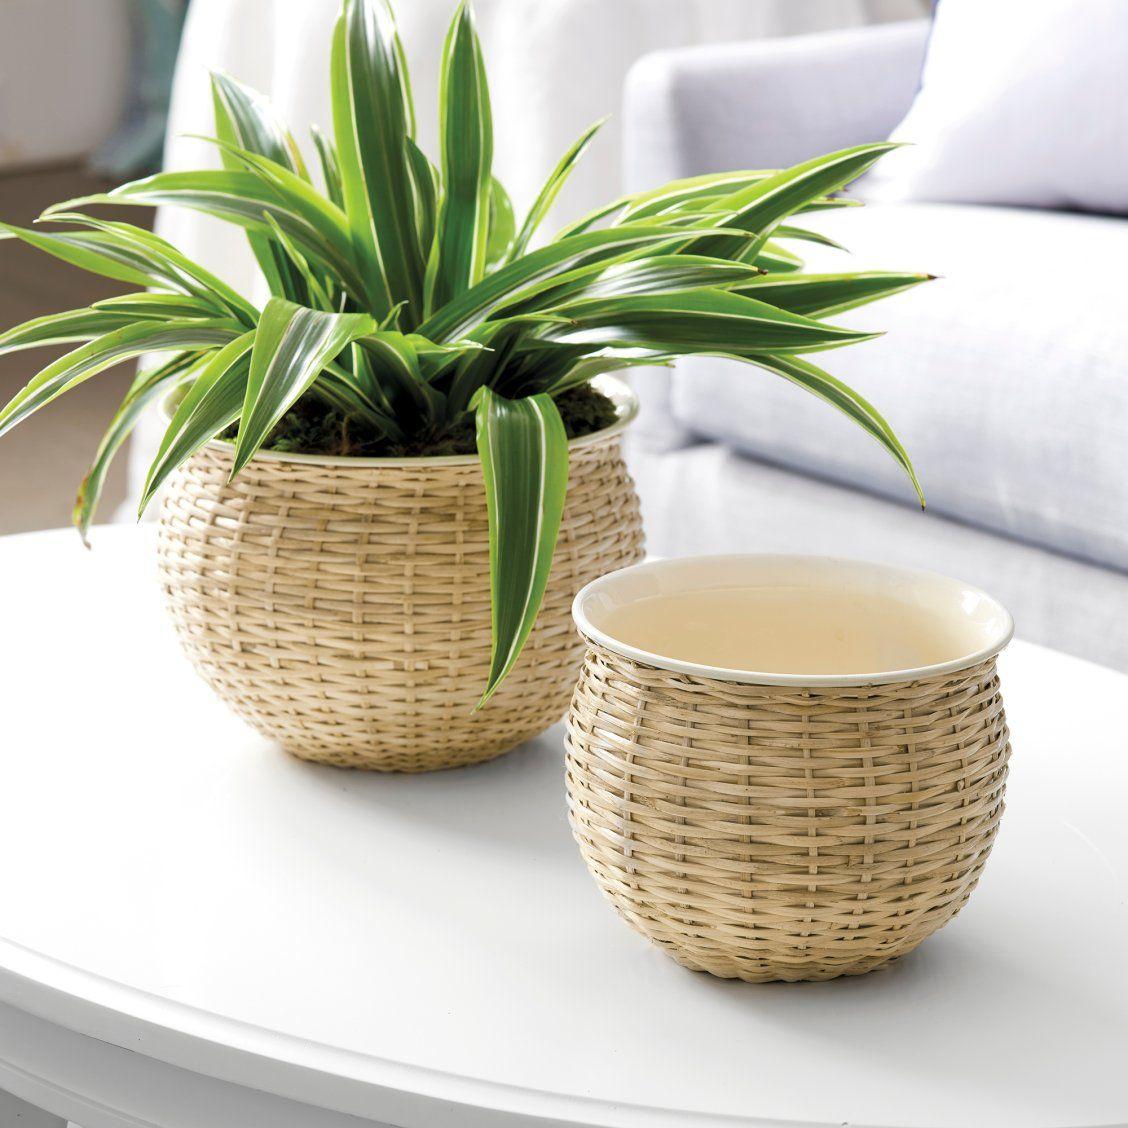 Enamel Wicker Pots Set Of 2 Pot Sets Trending Decor Home Decor Styles